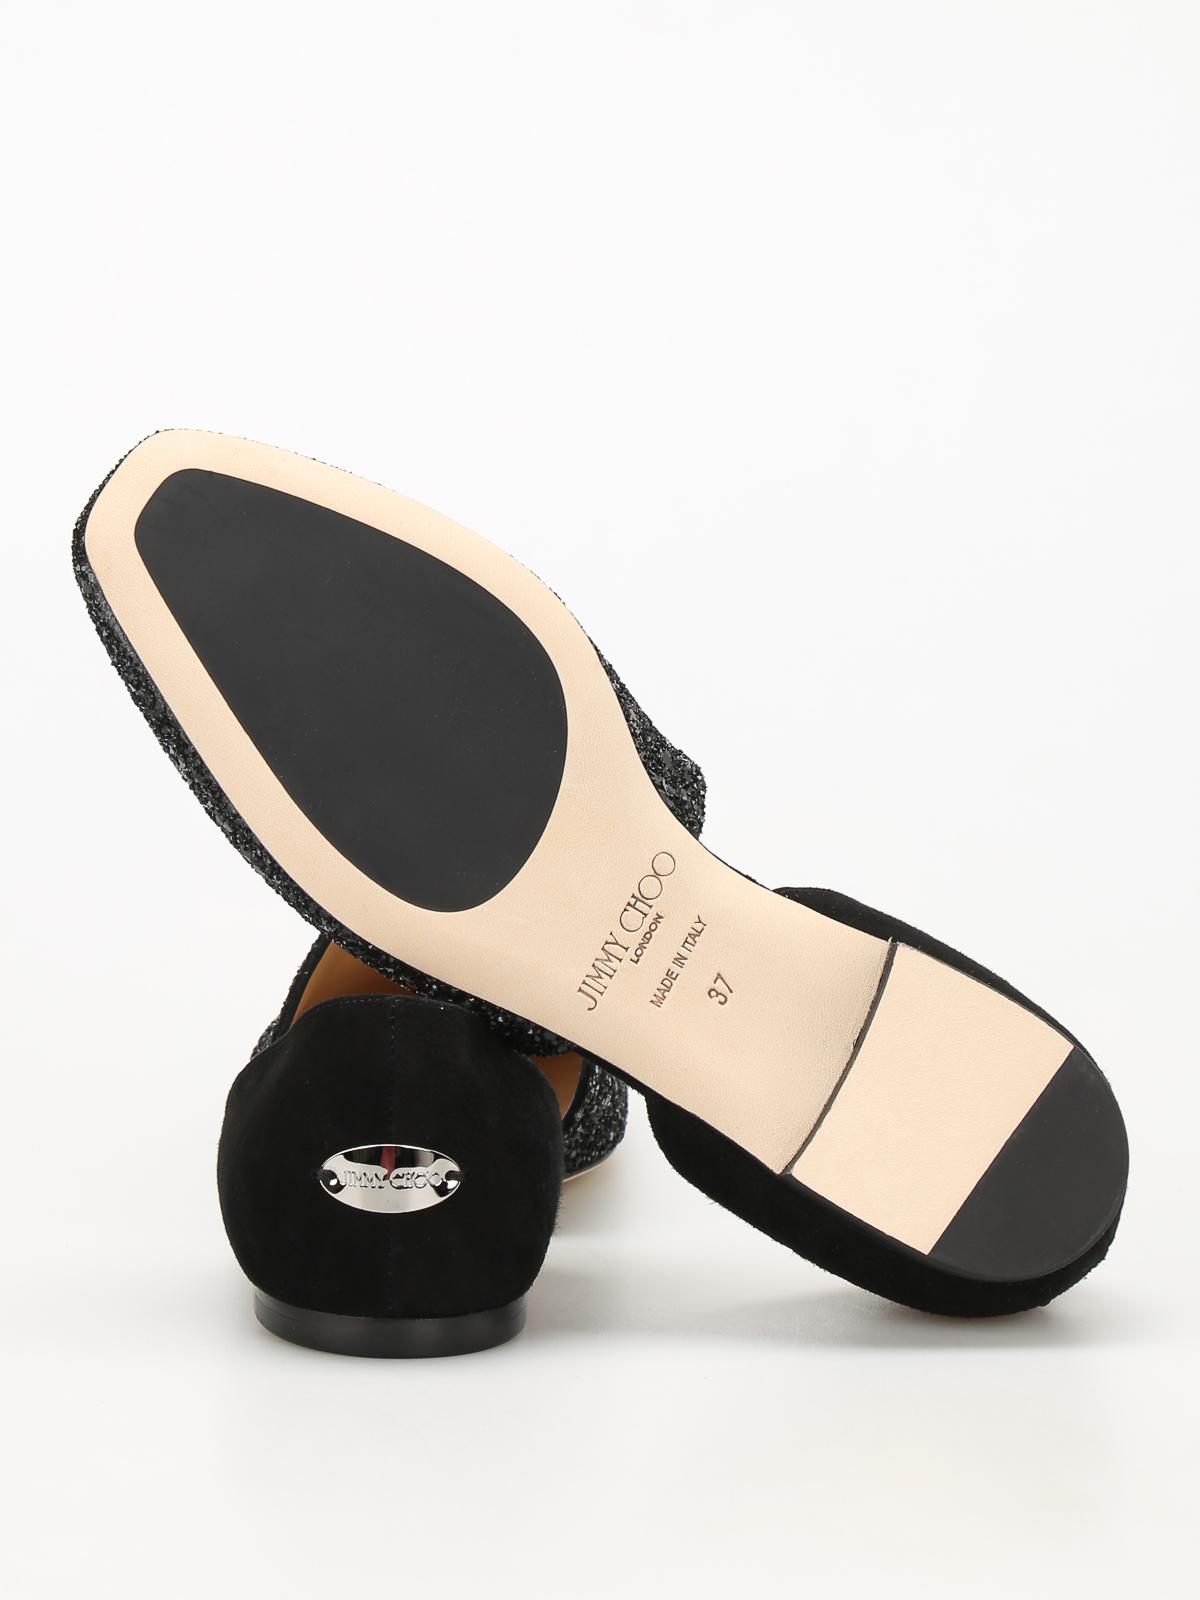 1b2d508d5365 Jimmy Choo - Globe Flat suede and glitter flats - flat shoes - GLOBE ...